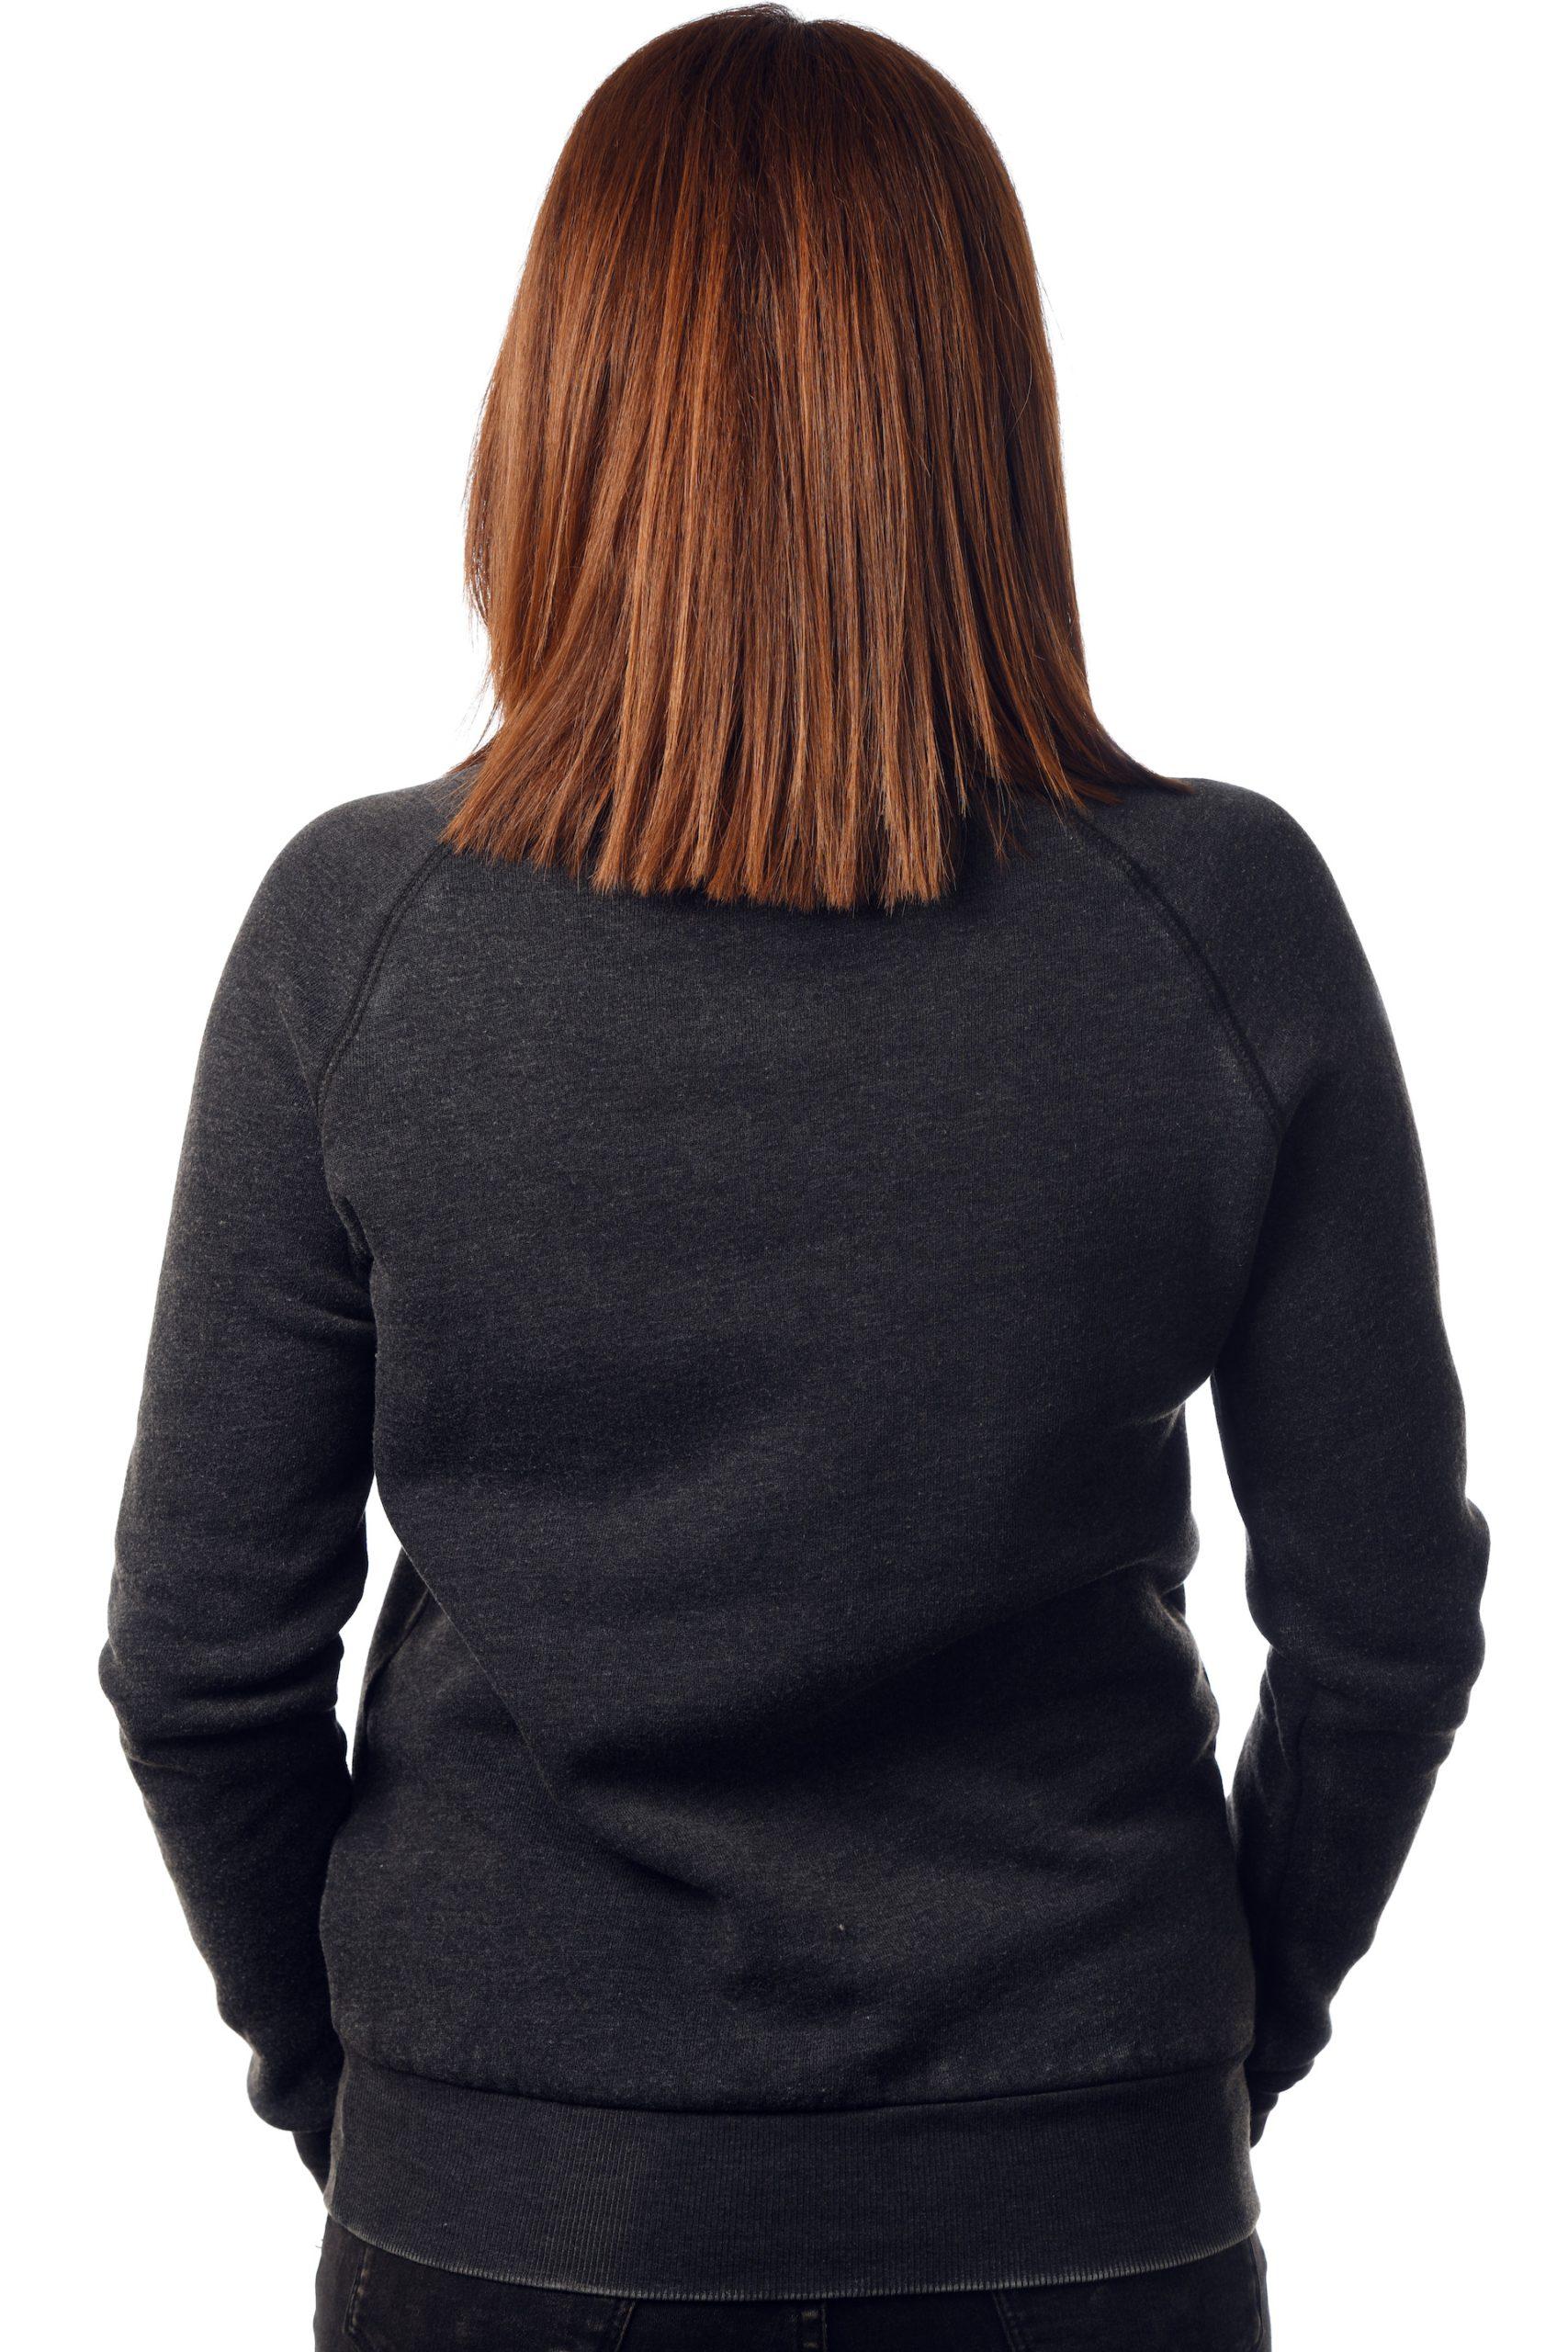 GG 798-B Unisex 'Wornwash' Old School Fleece Raglan Back 2